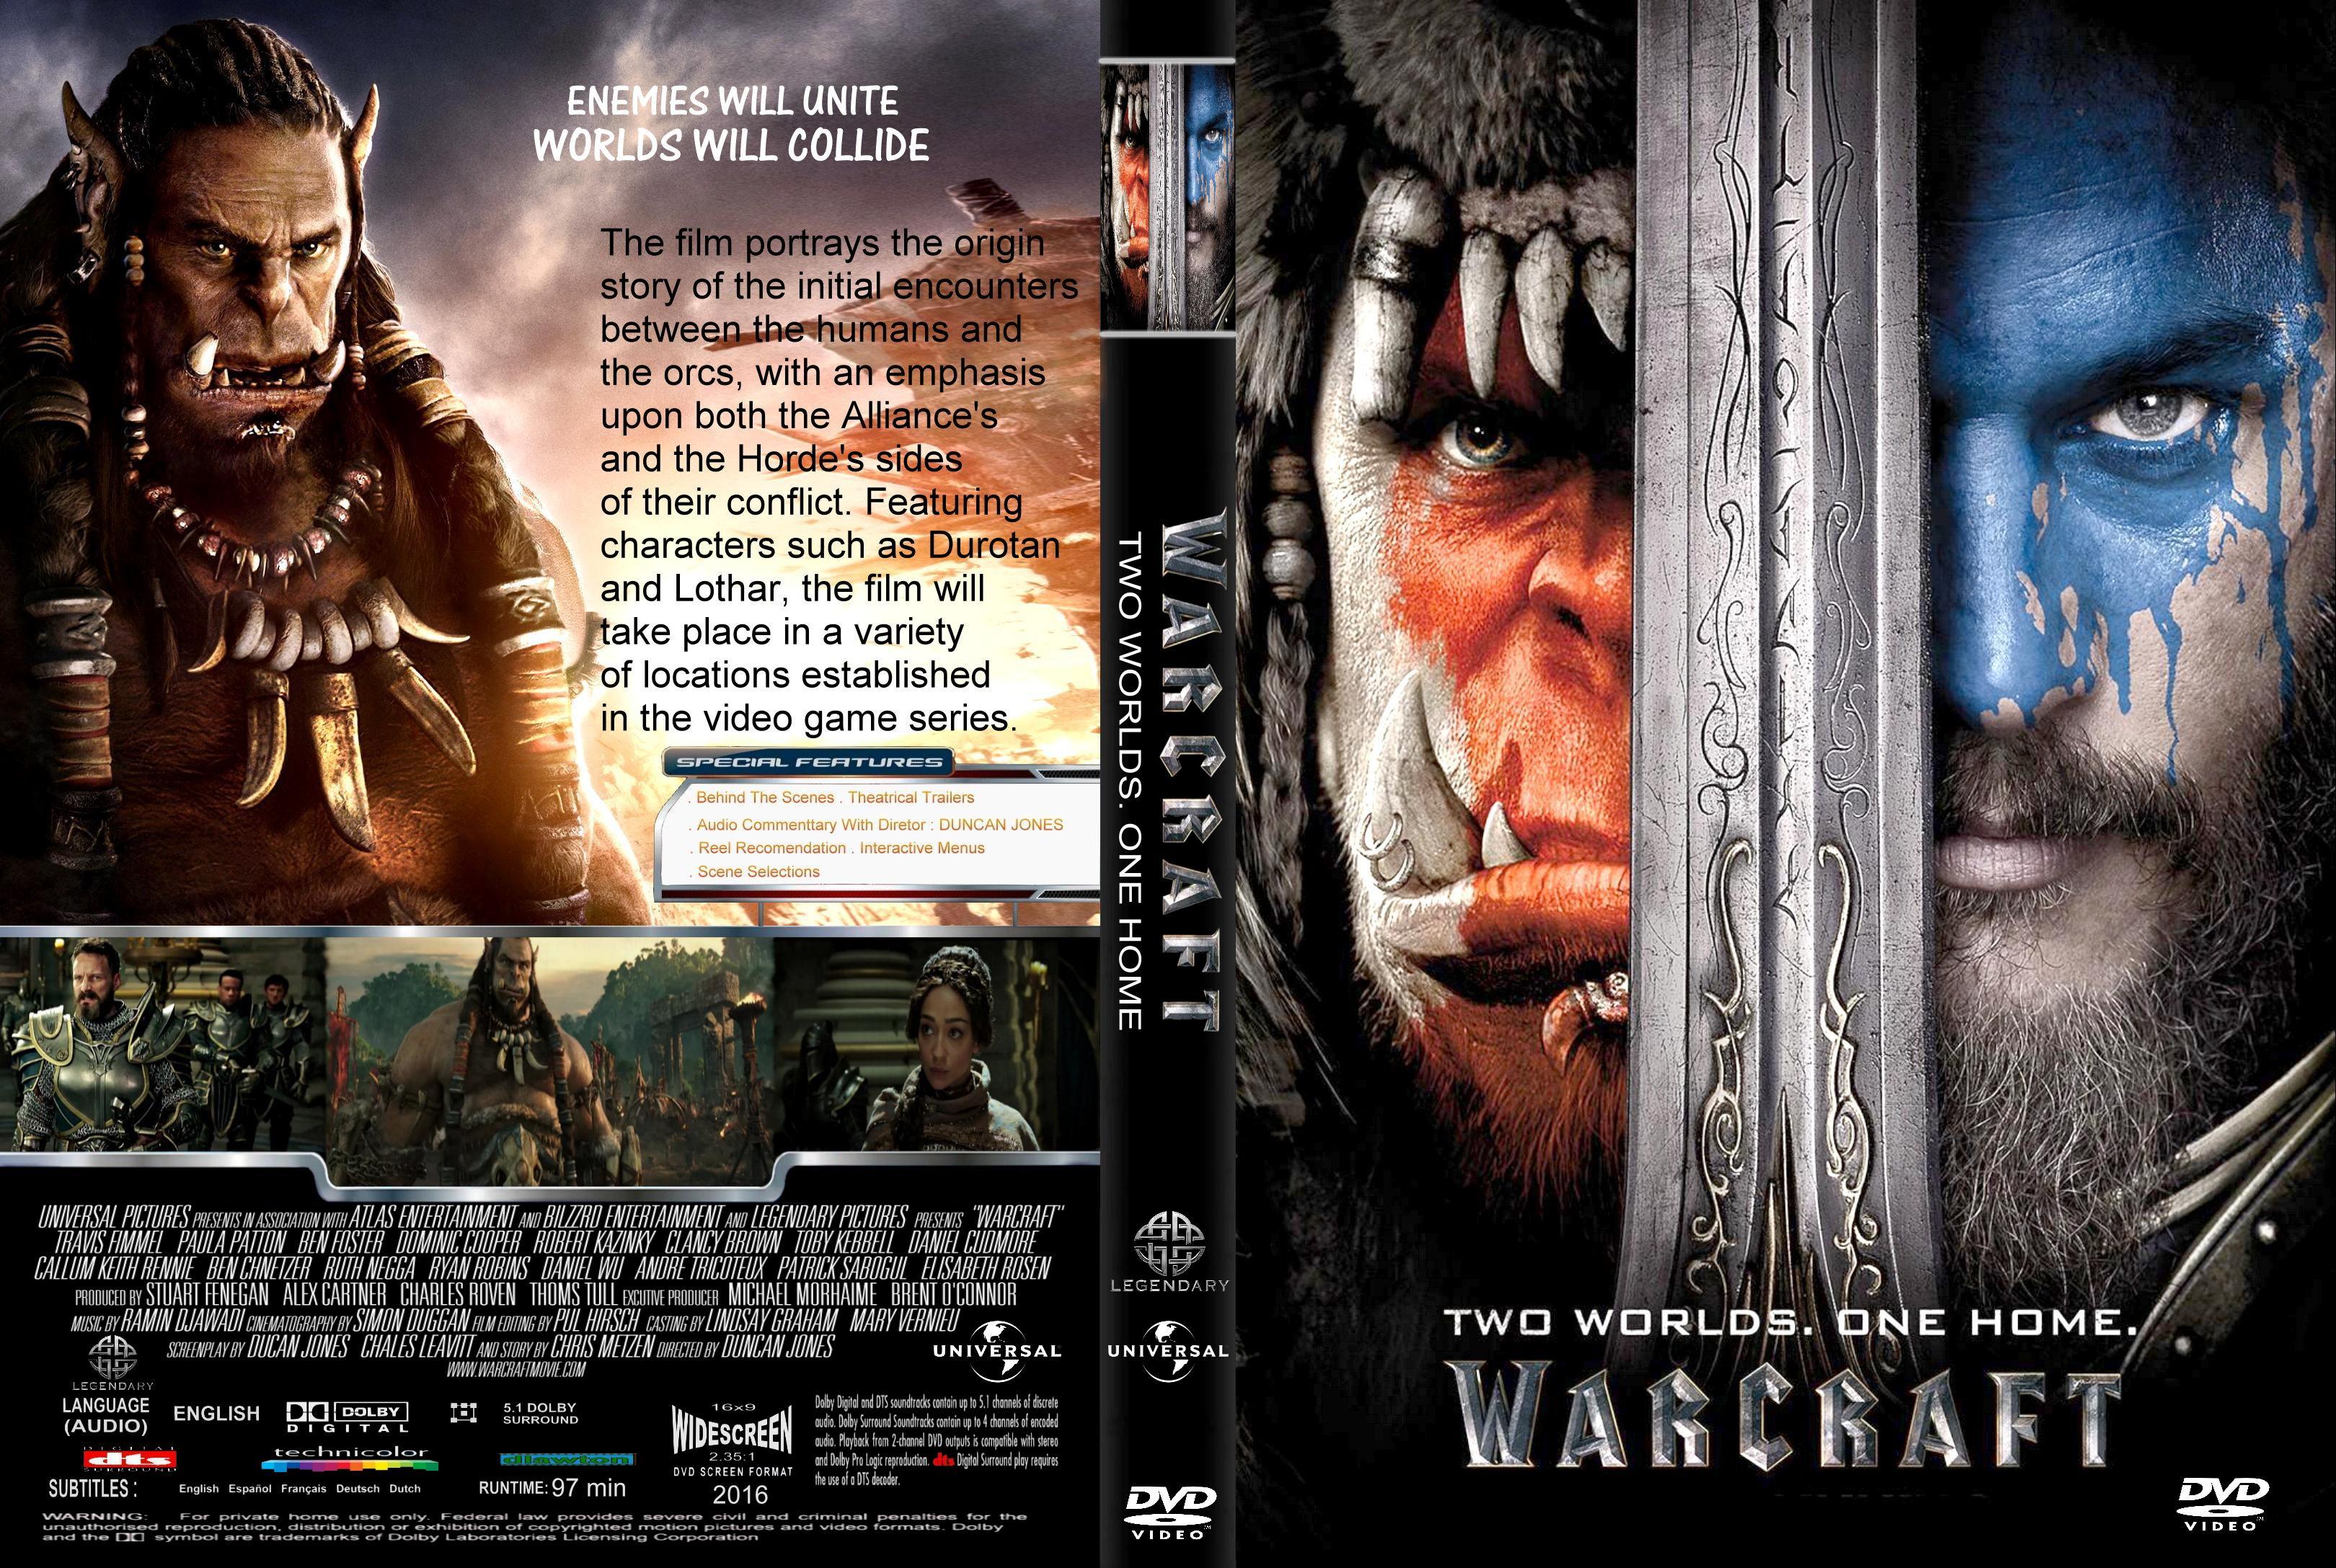 pimpandhost.com uploadded on 2016 AM ~]]] (Estreno) Warcraft El origen (Latino)